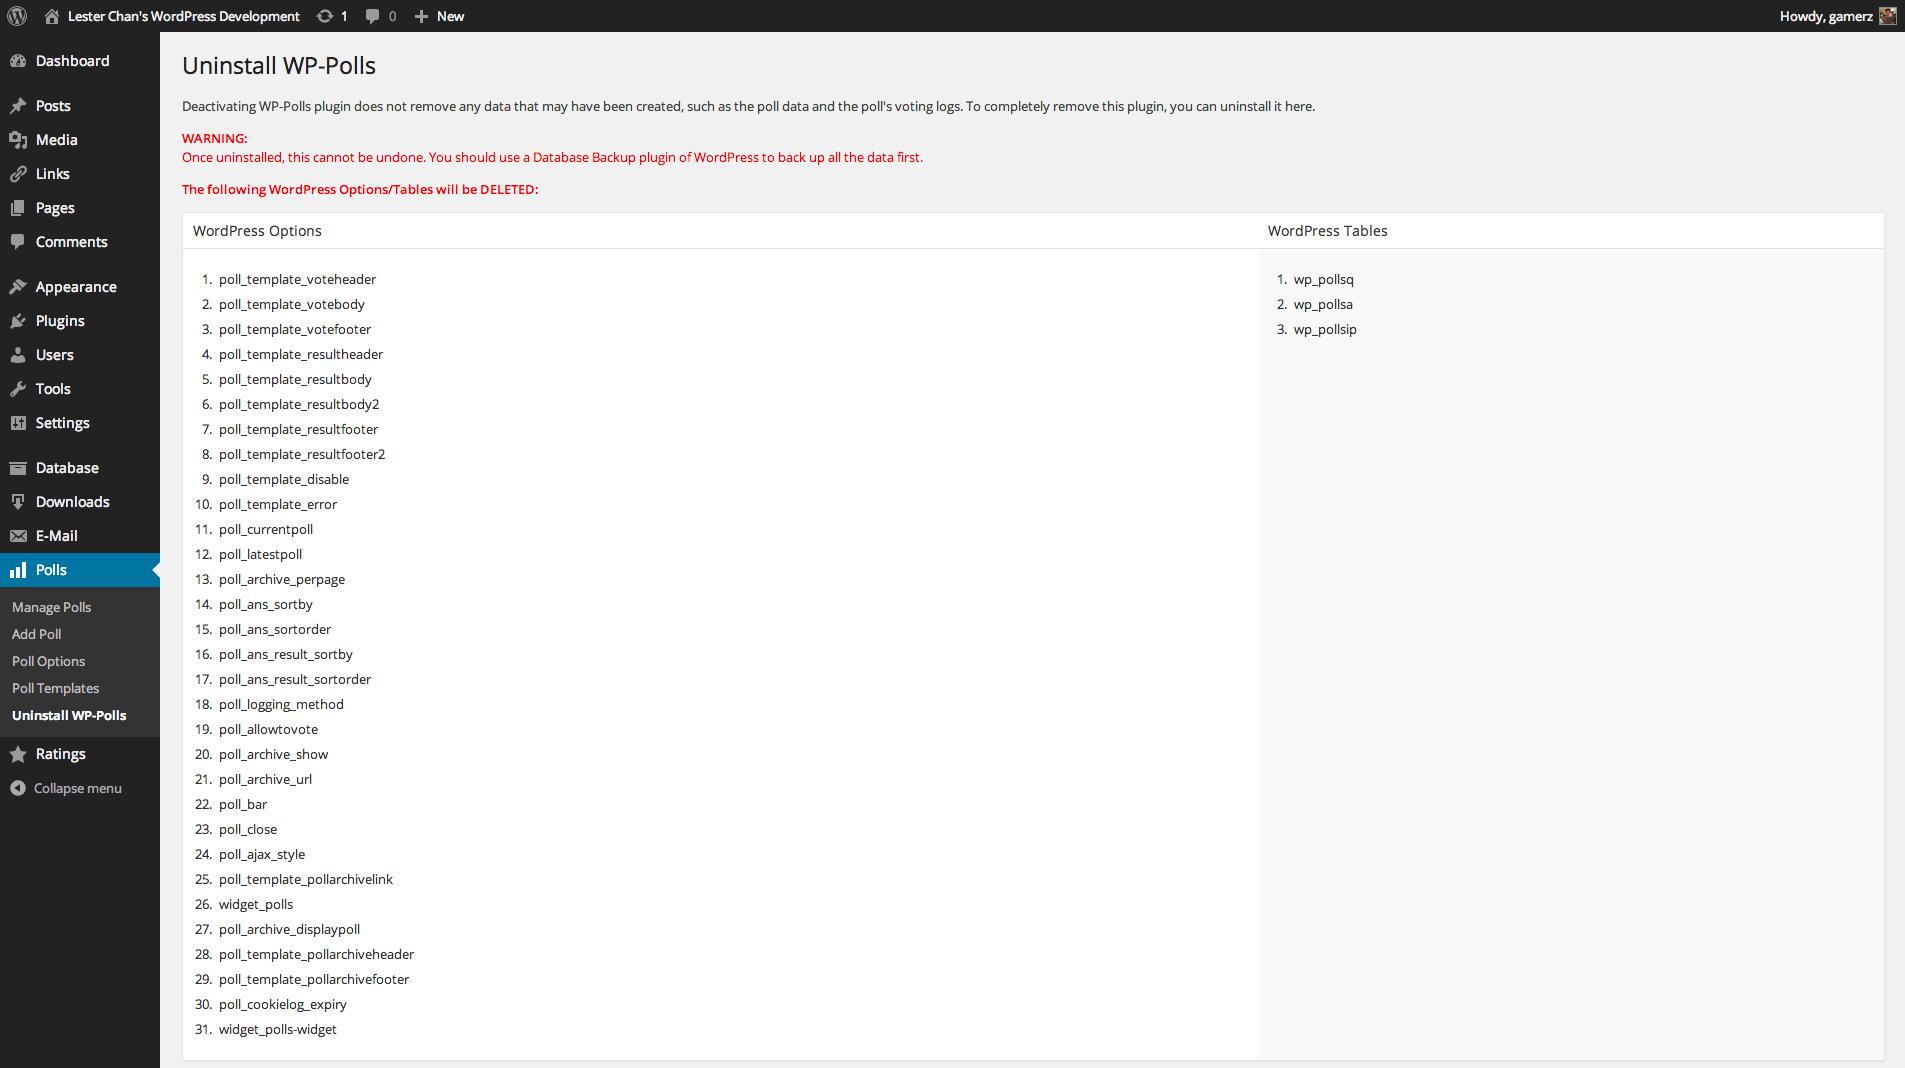 WP-Polls's Screenshot: Admin - Uninstall Poll